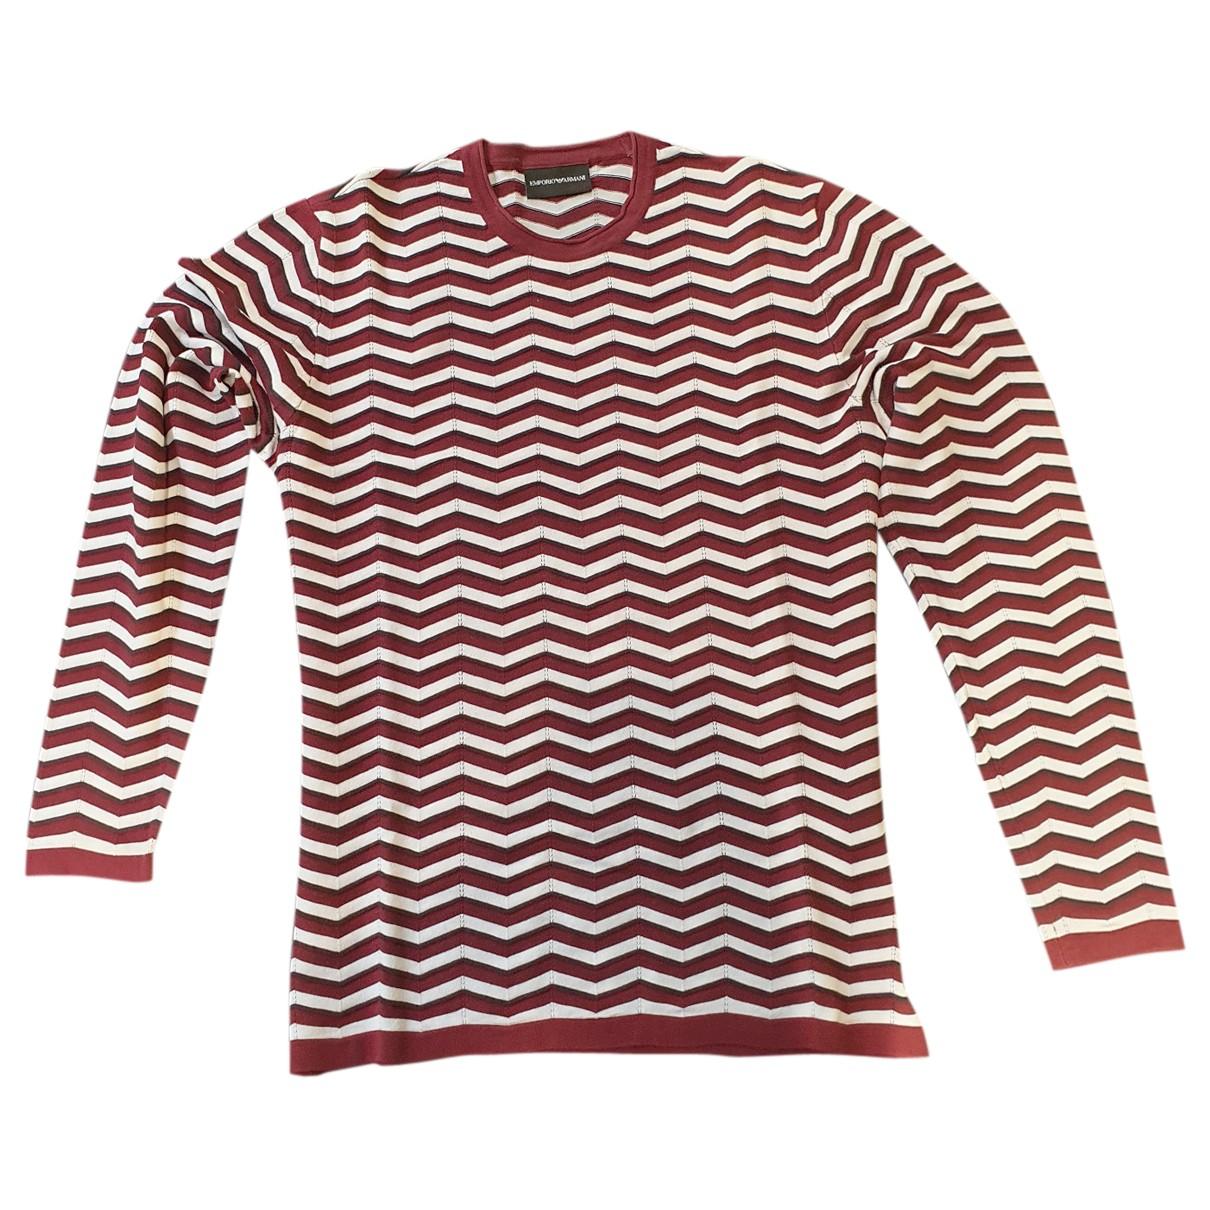 Emporio Armani N Knitwear & Sweatshirts for Men M International